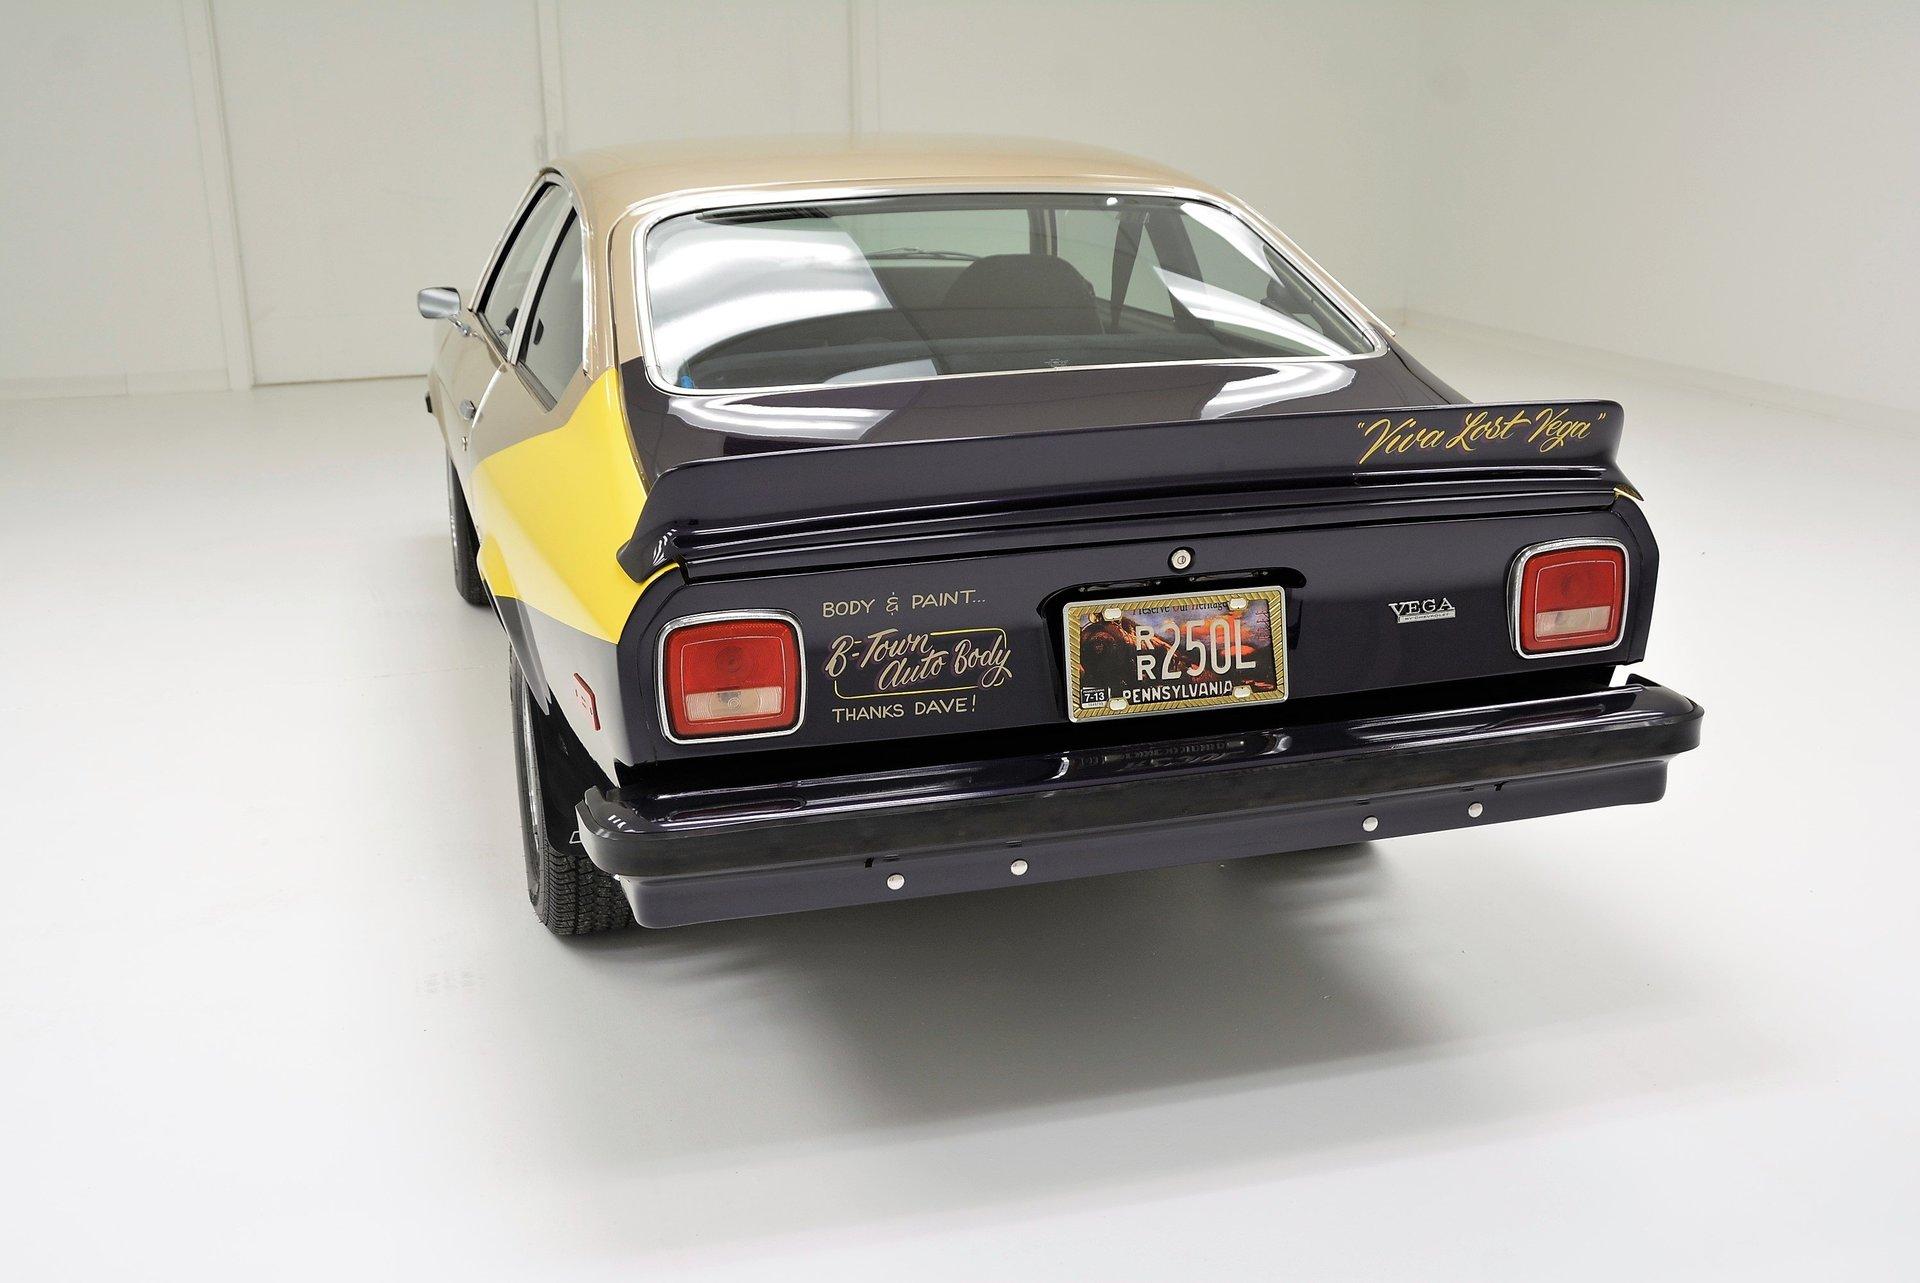 1974 Chevrolet Vega Hatchback for sale #65169 | MCG